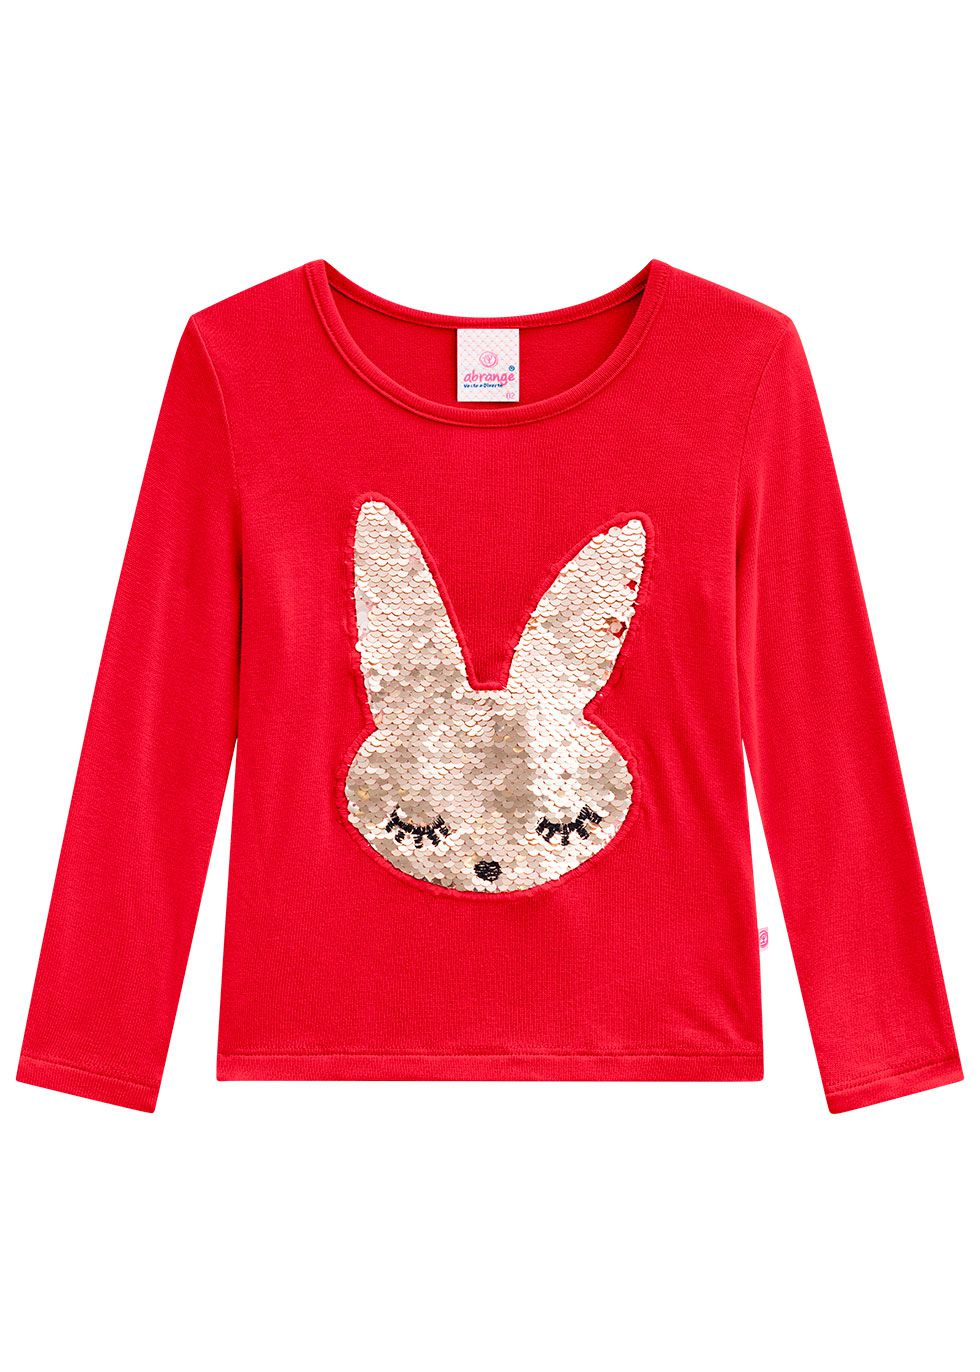 Blusa Infantil Feminina Inverno Vermelha Bunny Abrange